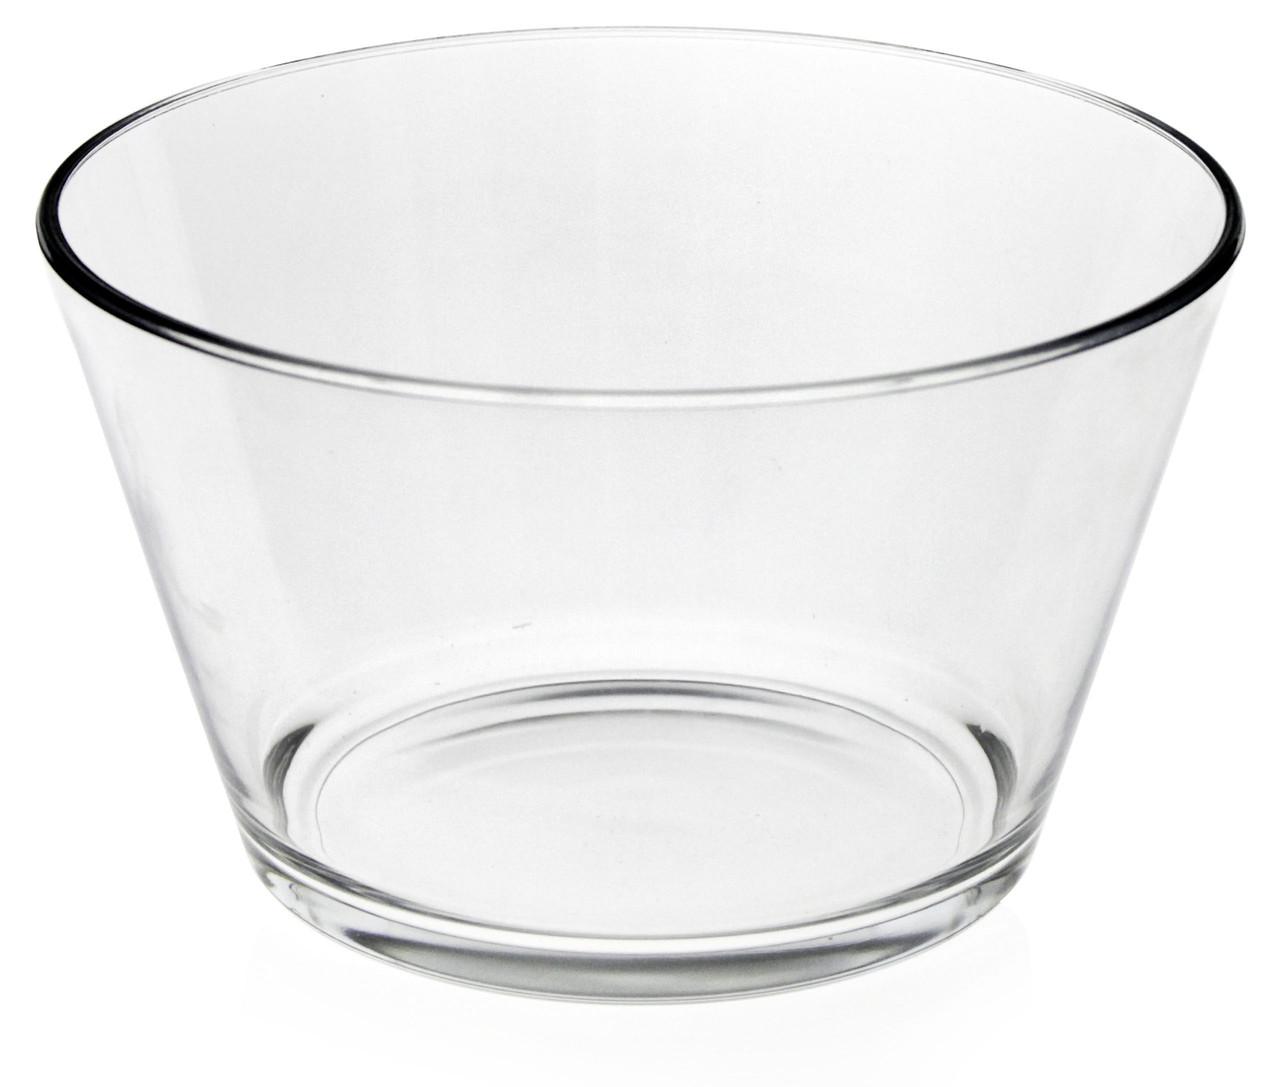 Салатник Krosno Basic Glass 13 см J481156800002000